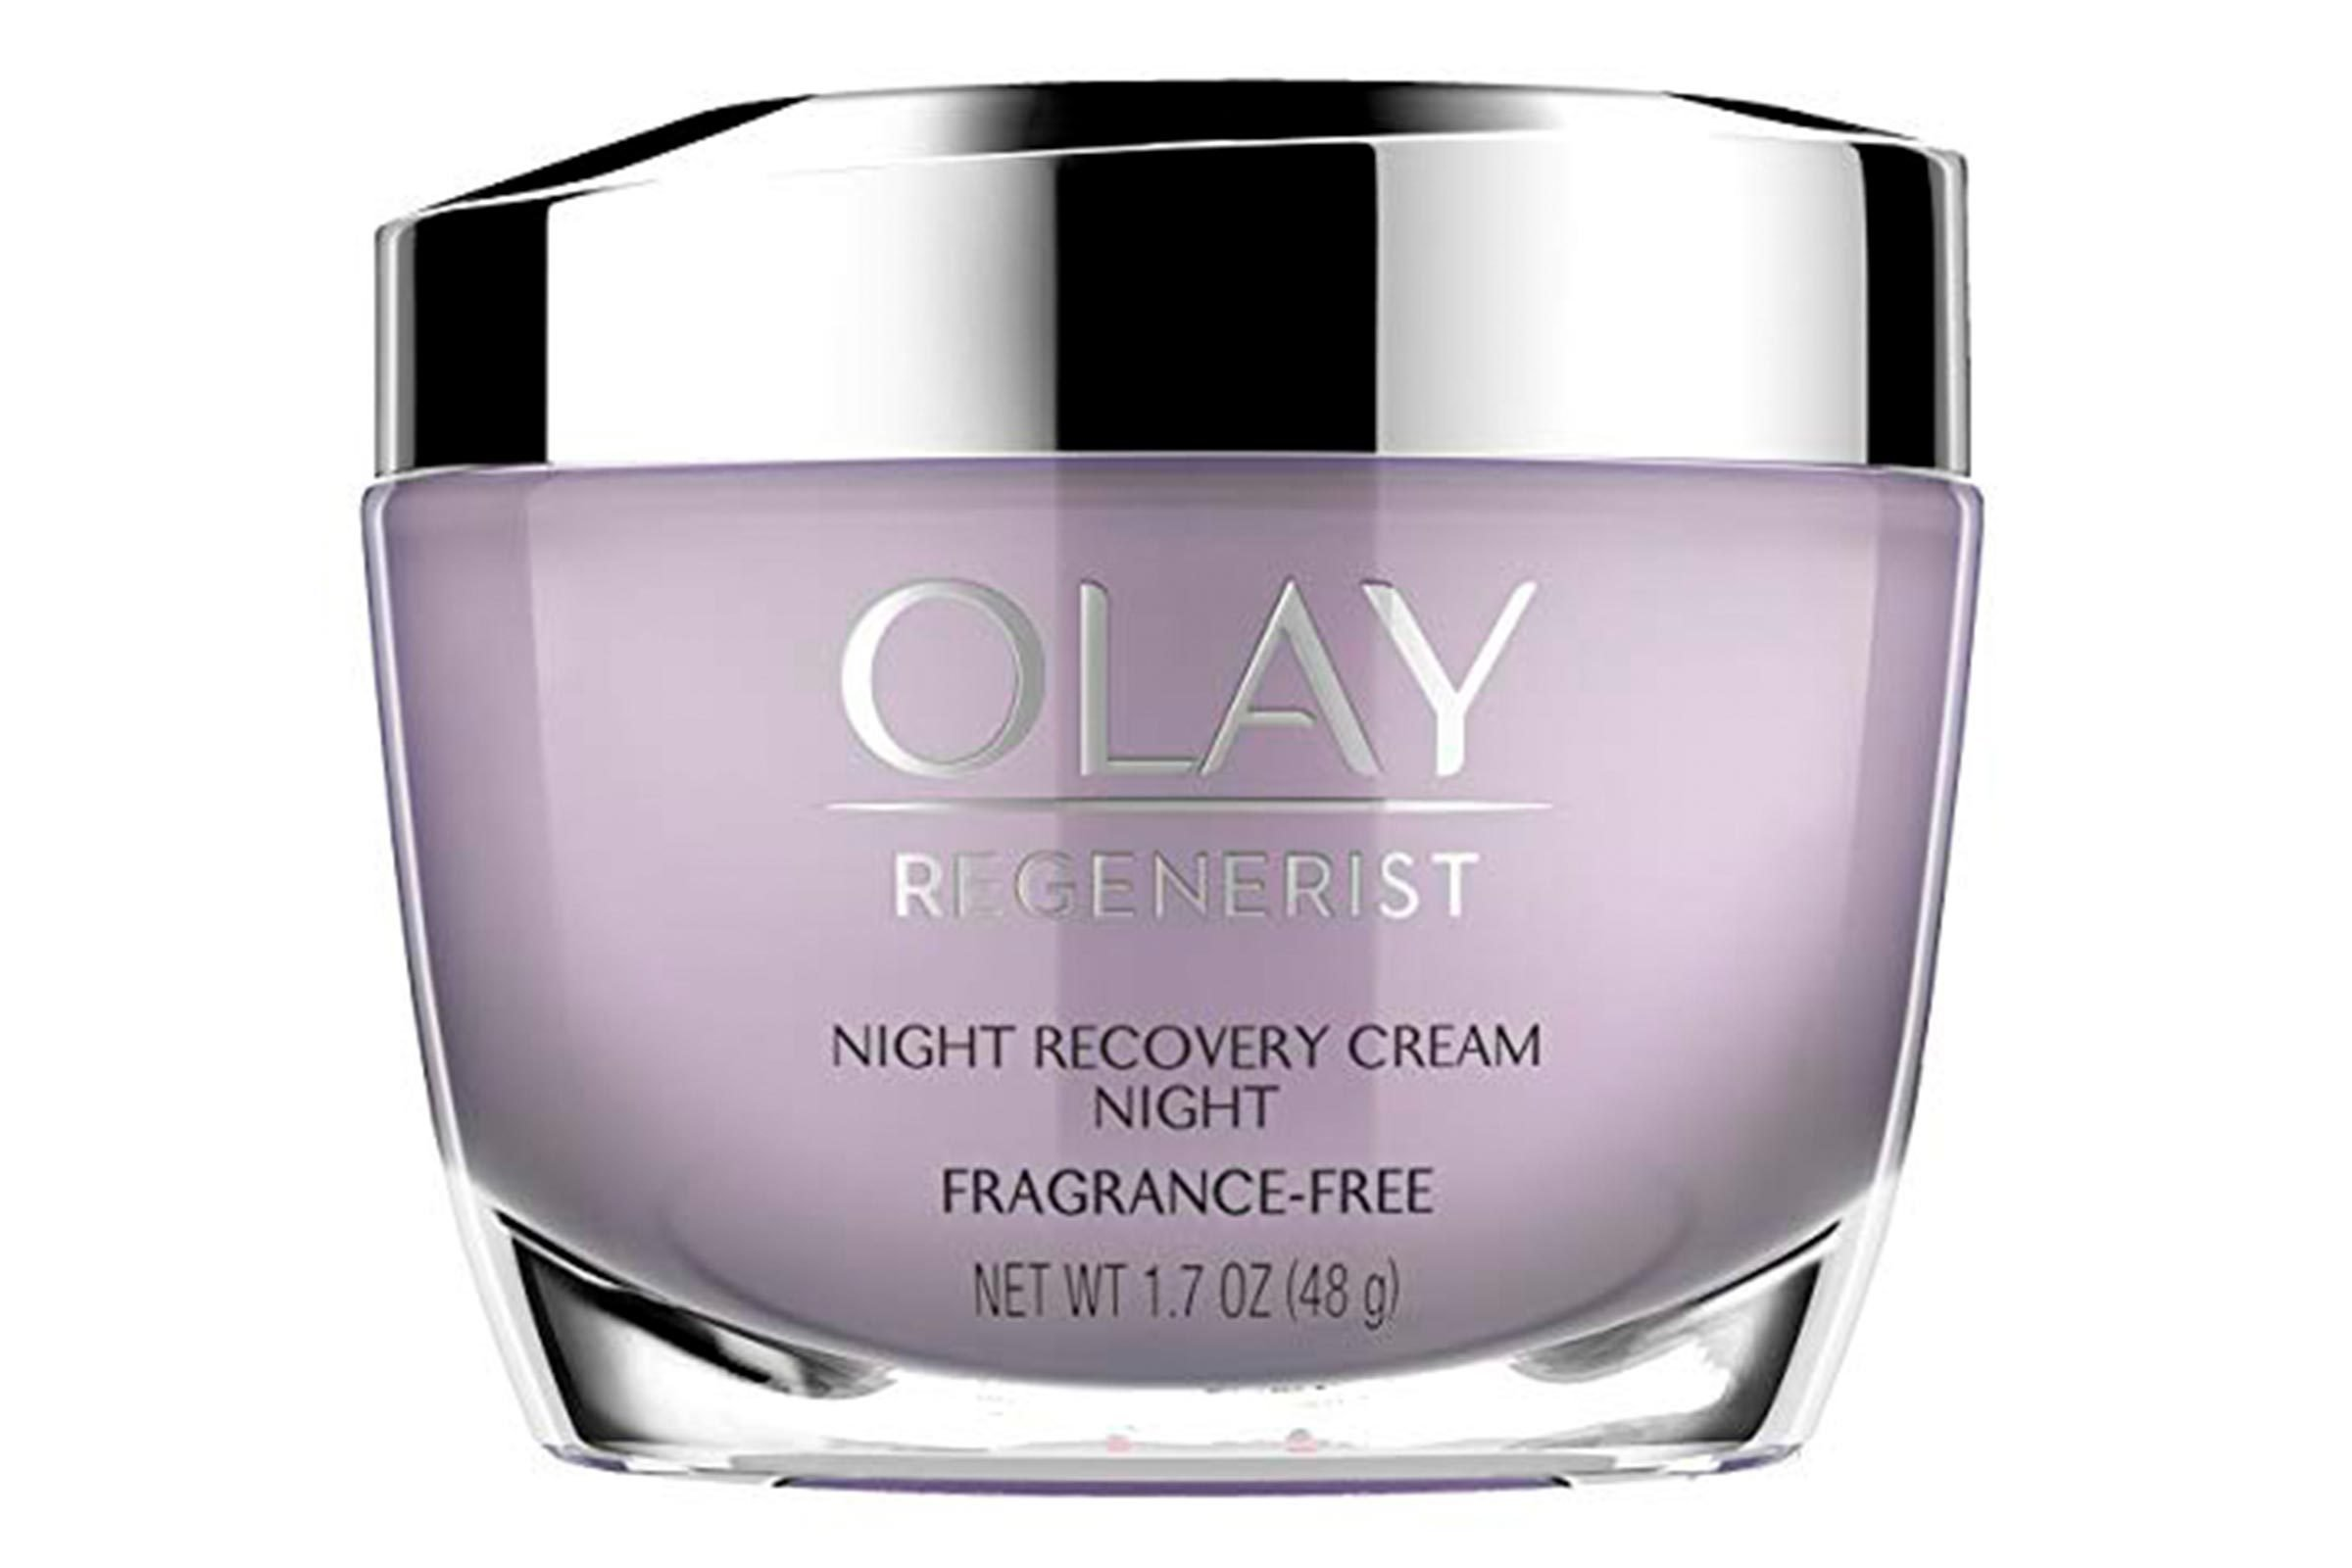 Olay Night Recovery Cream